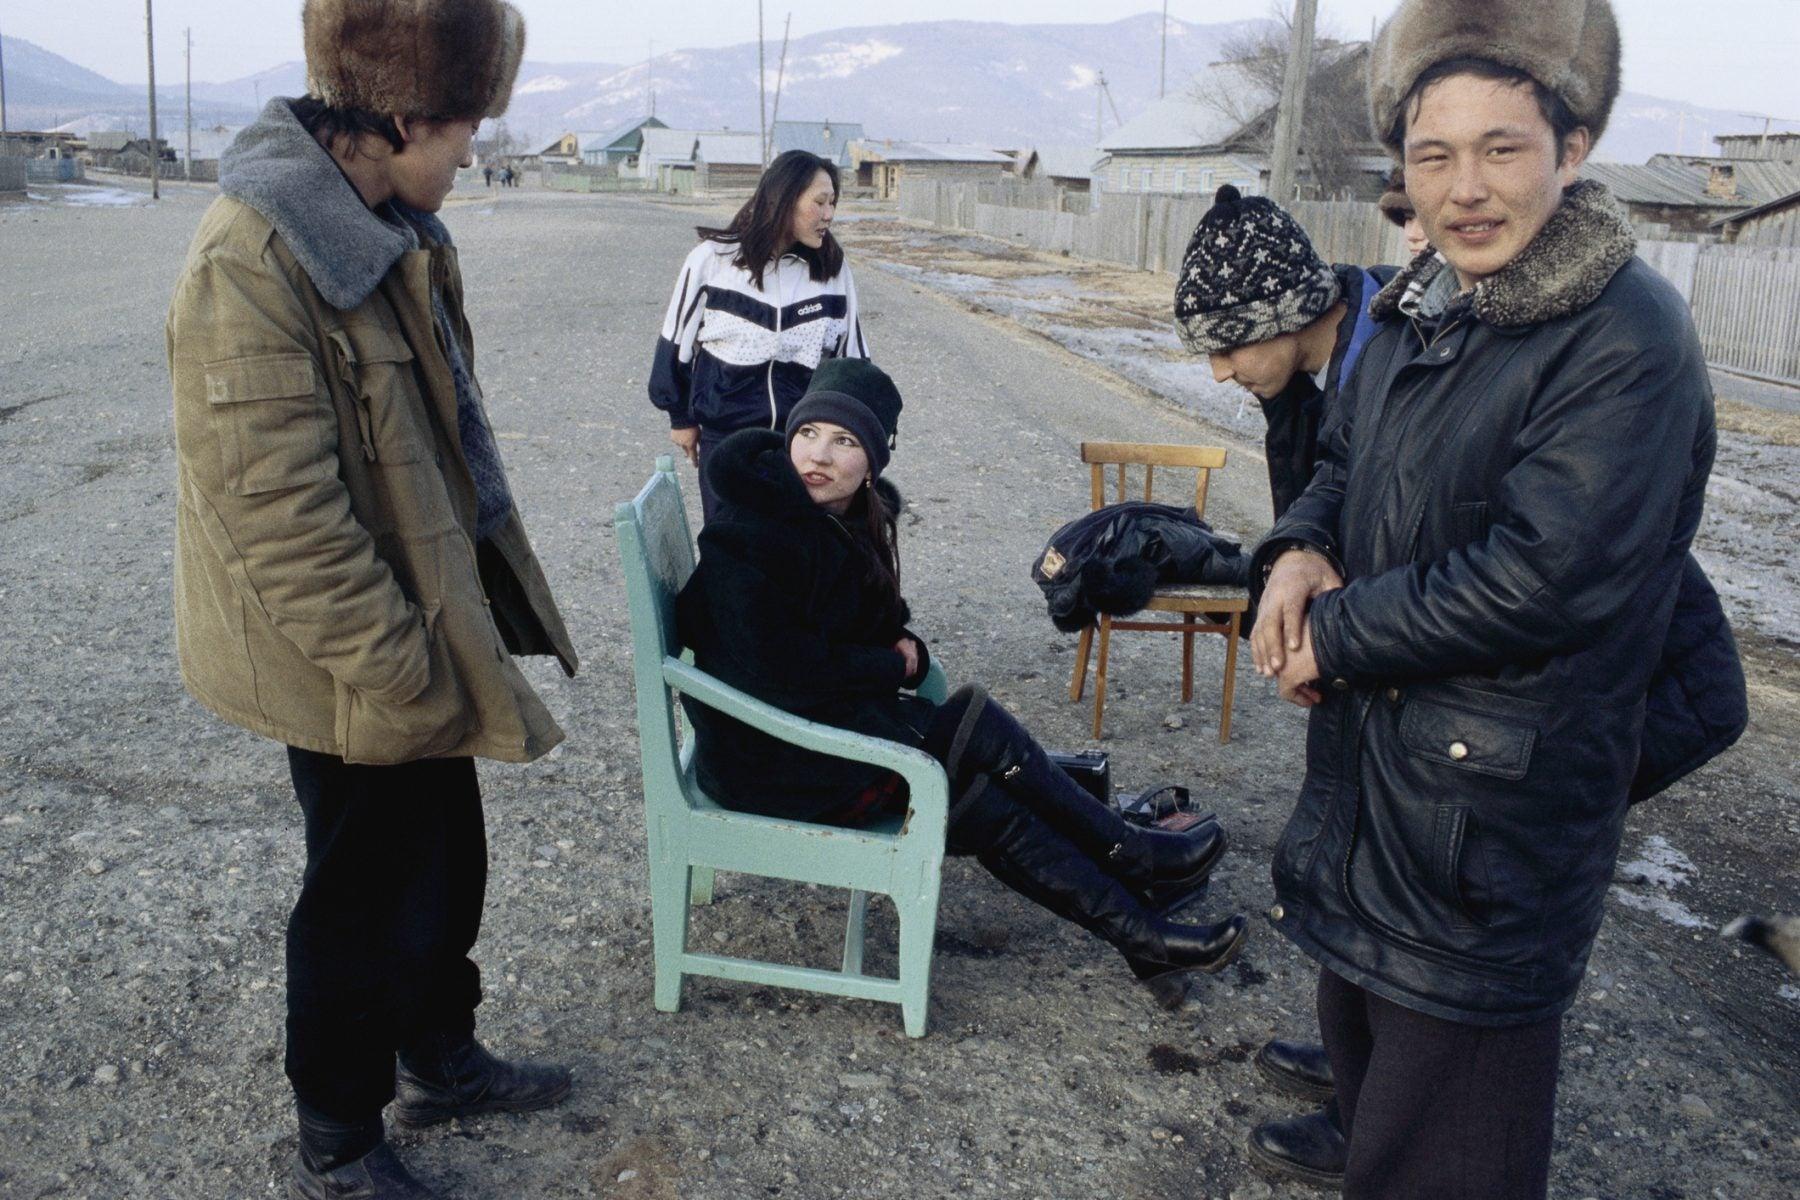 Teenagers in a Siberian village near Lake Baikal